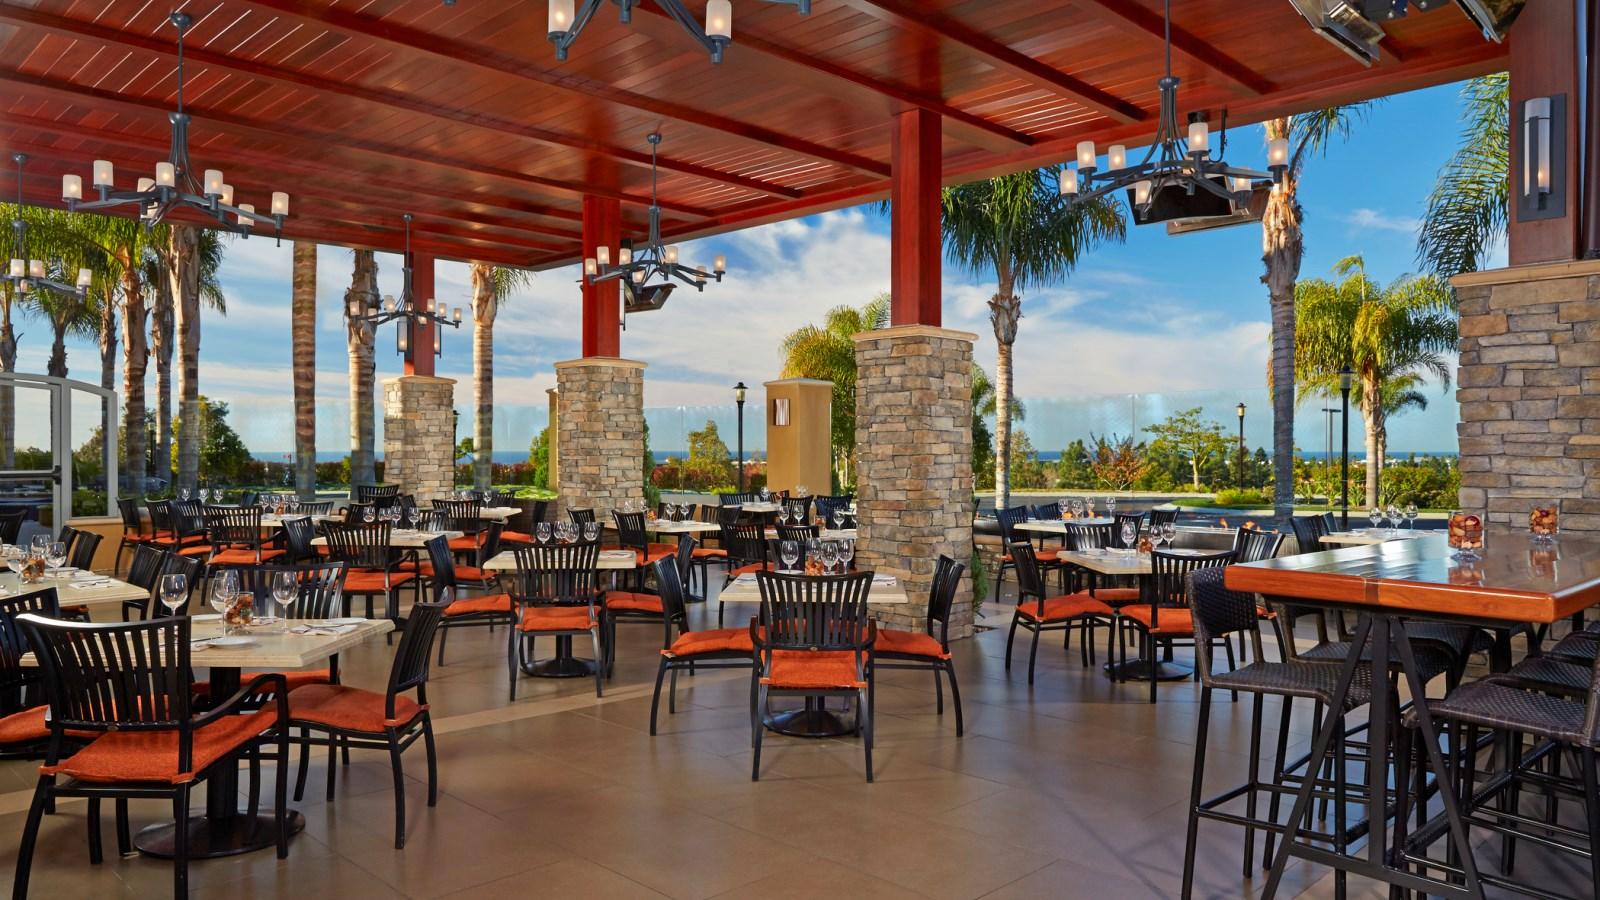 Visiting carlsbad california coast to coast newspaper for Fish restaurant carlsbad